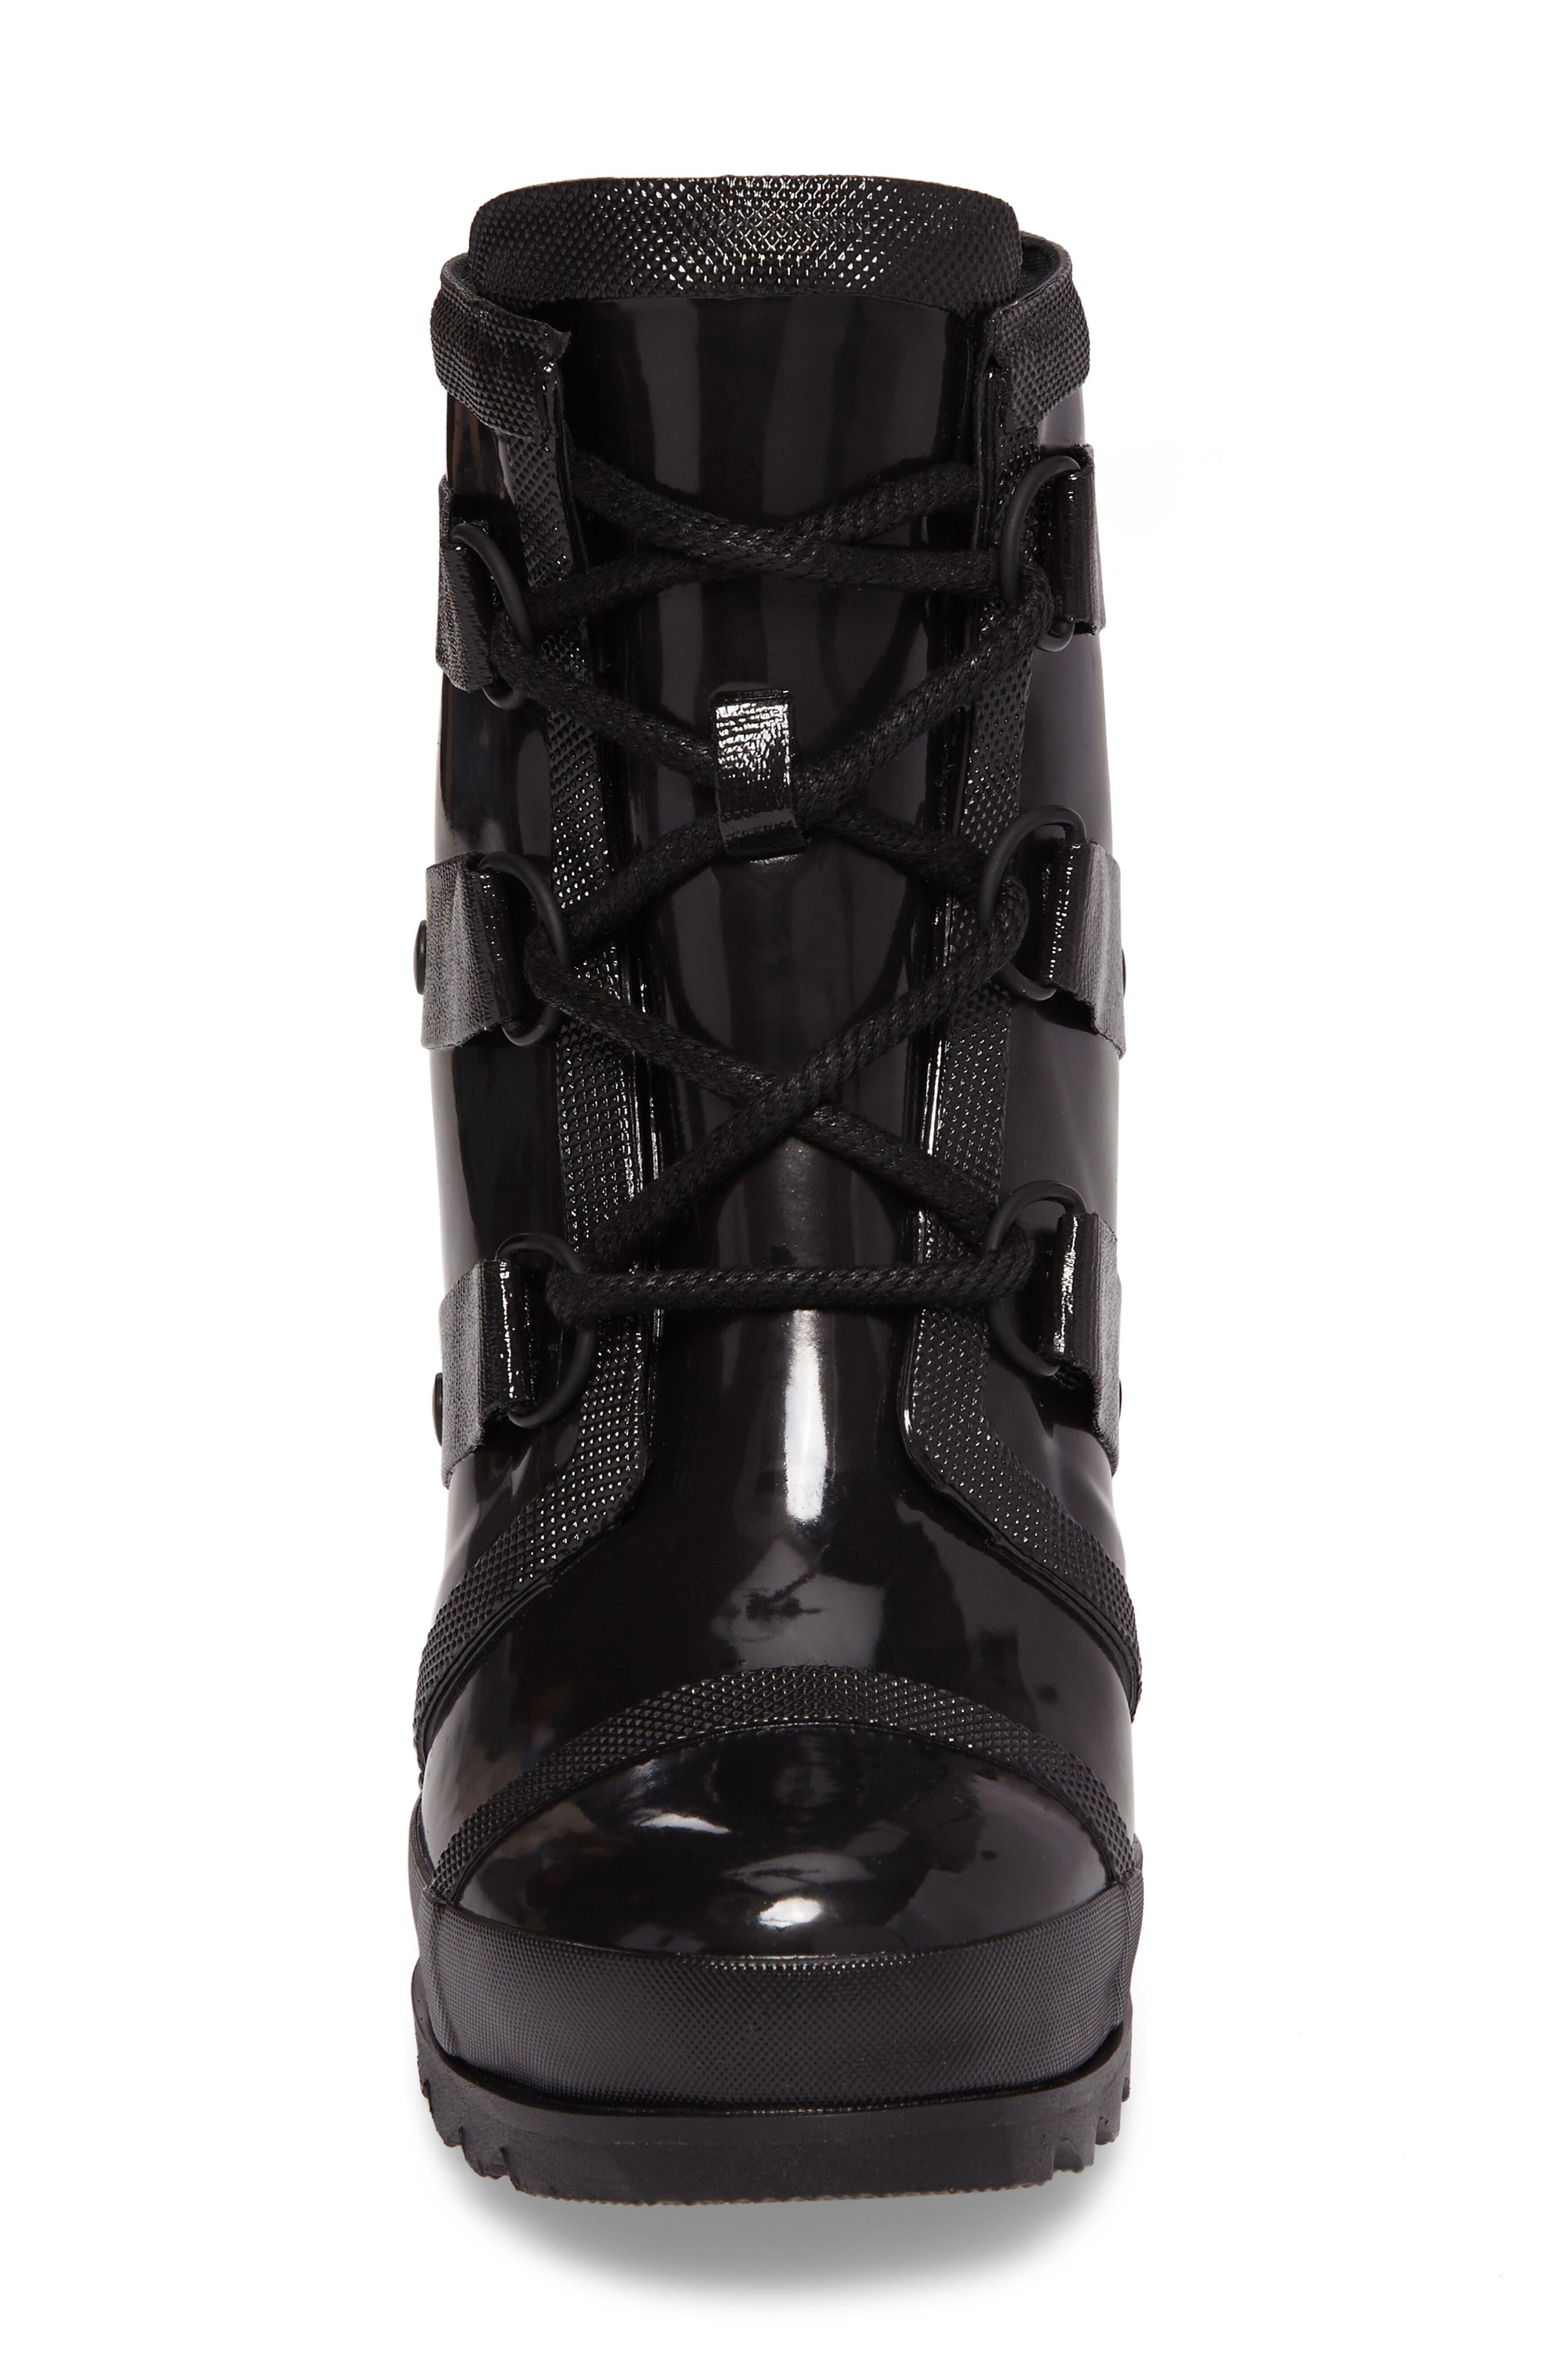 Joan Glossy Wedge Rain Boot,                             Alternate thumbnail 4, color,                             BLACK/ SEA SALT